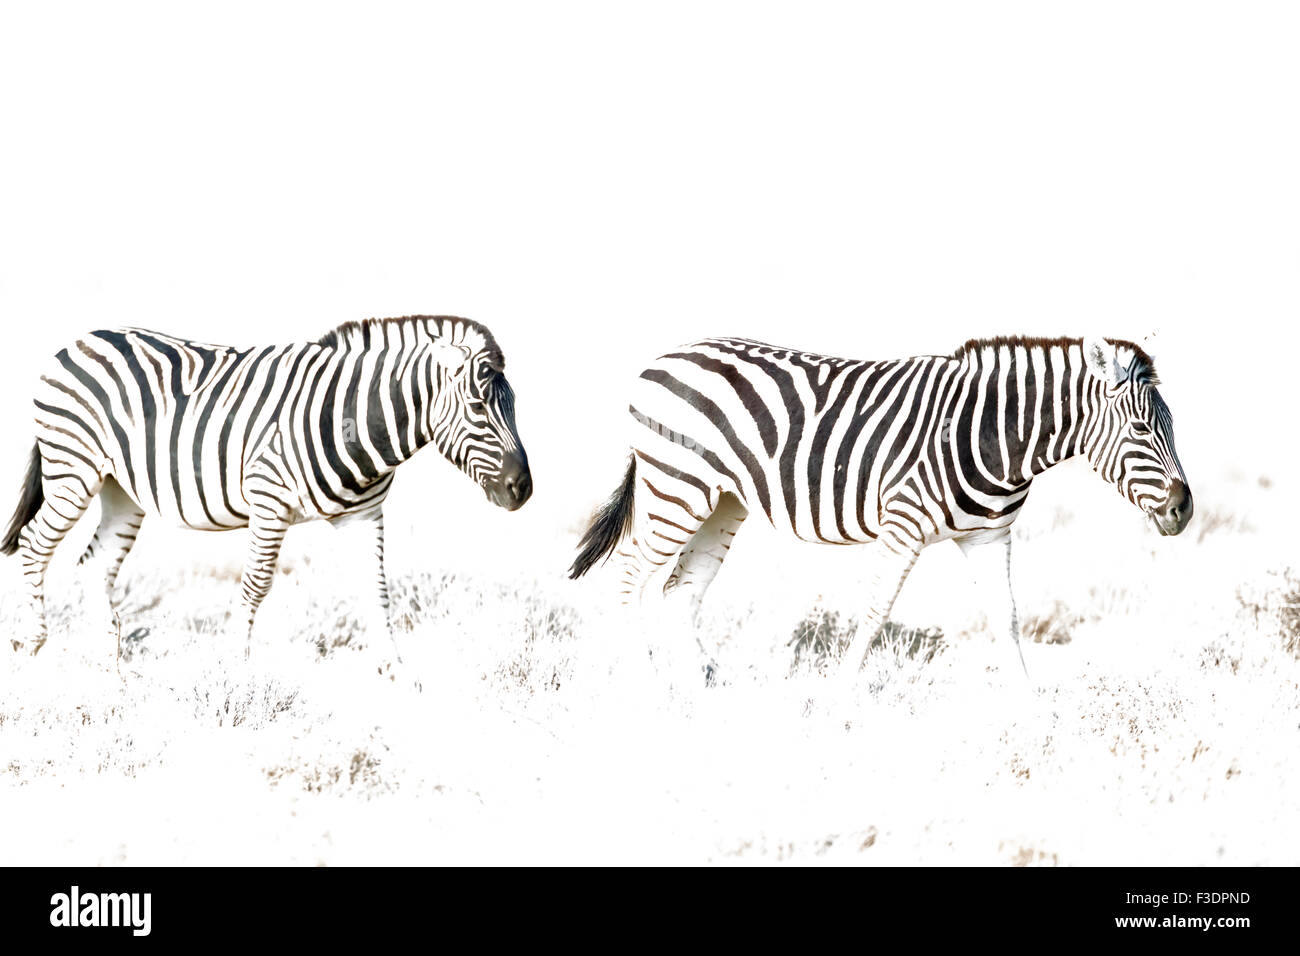 Burchell's zebras (Equus quagga burchellii) roaming, Etosha National Park, Namibia - Stock Image